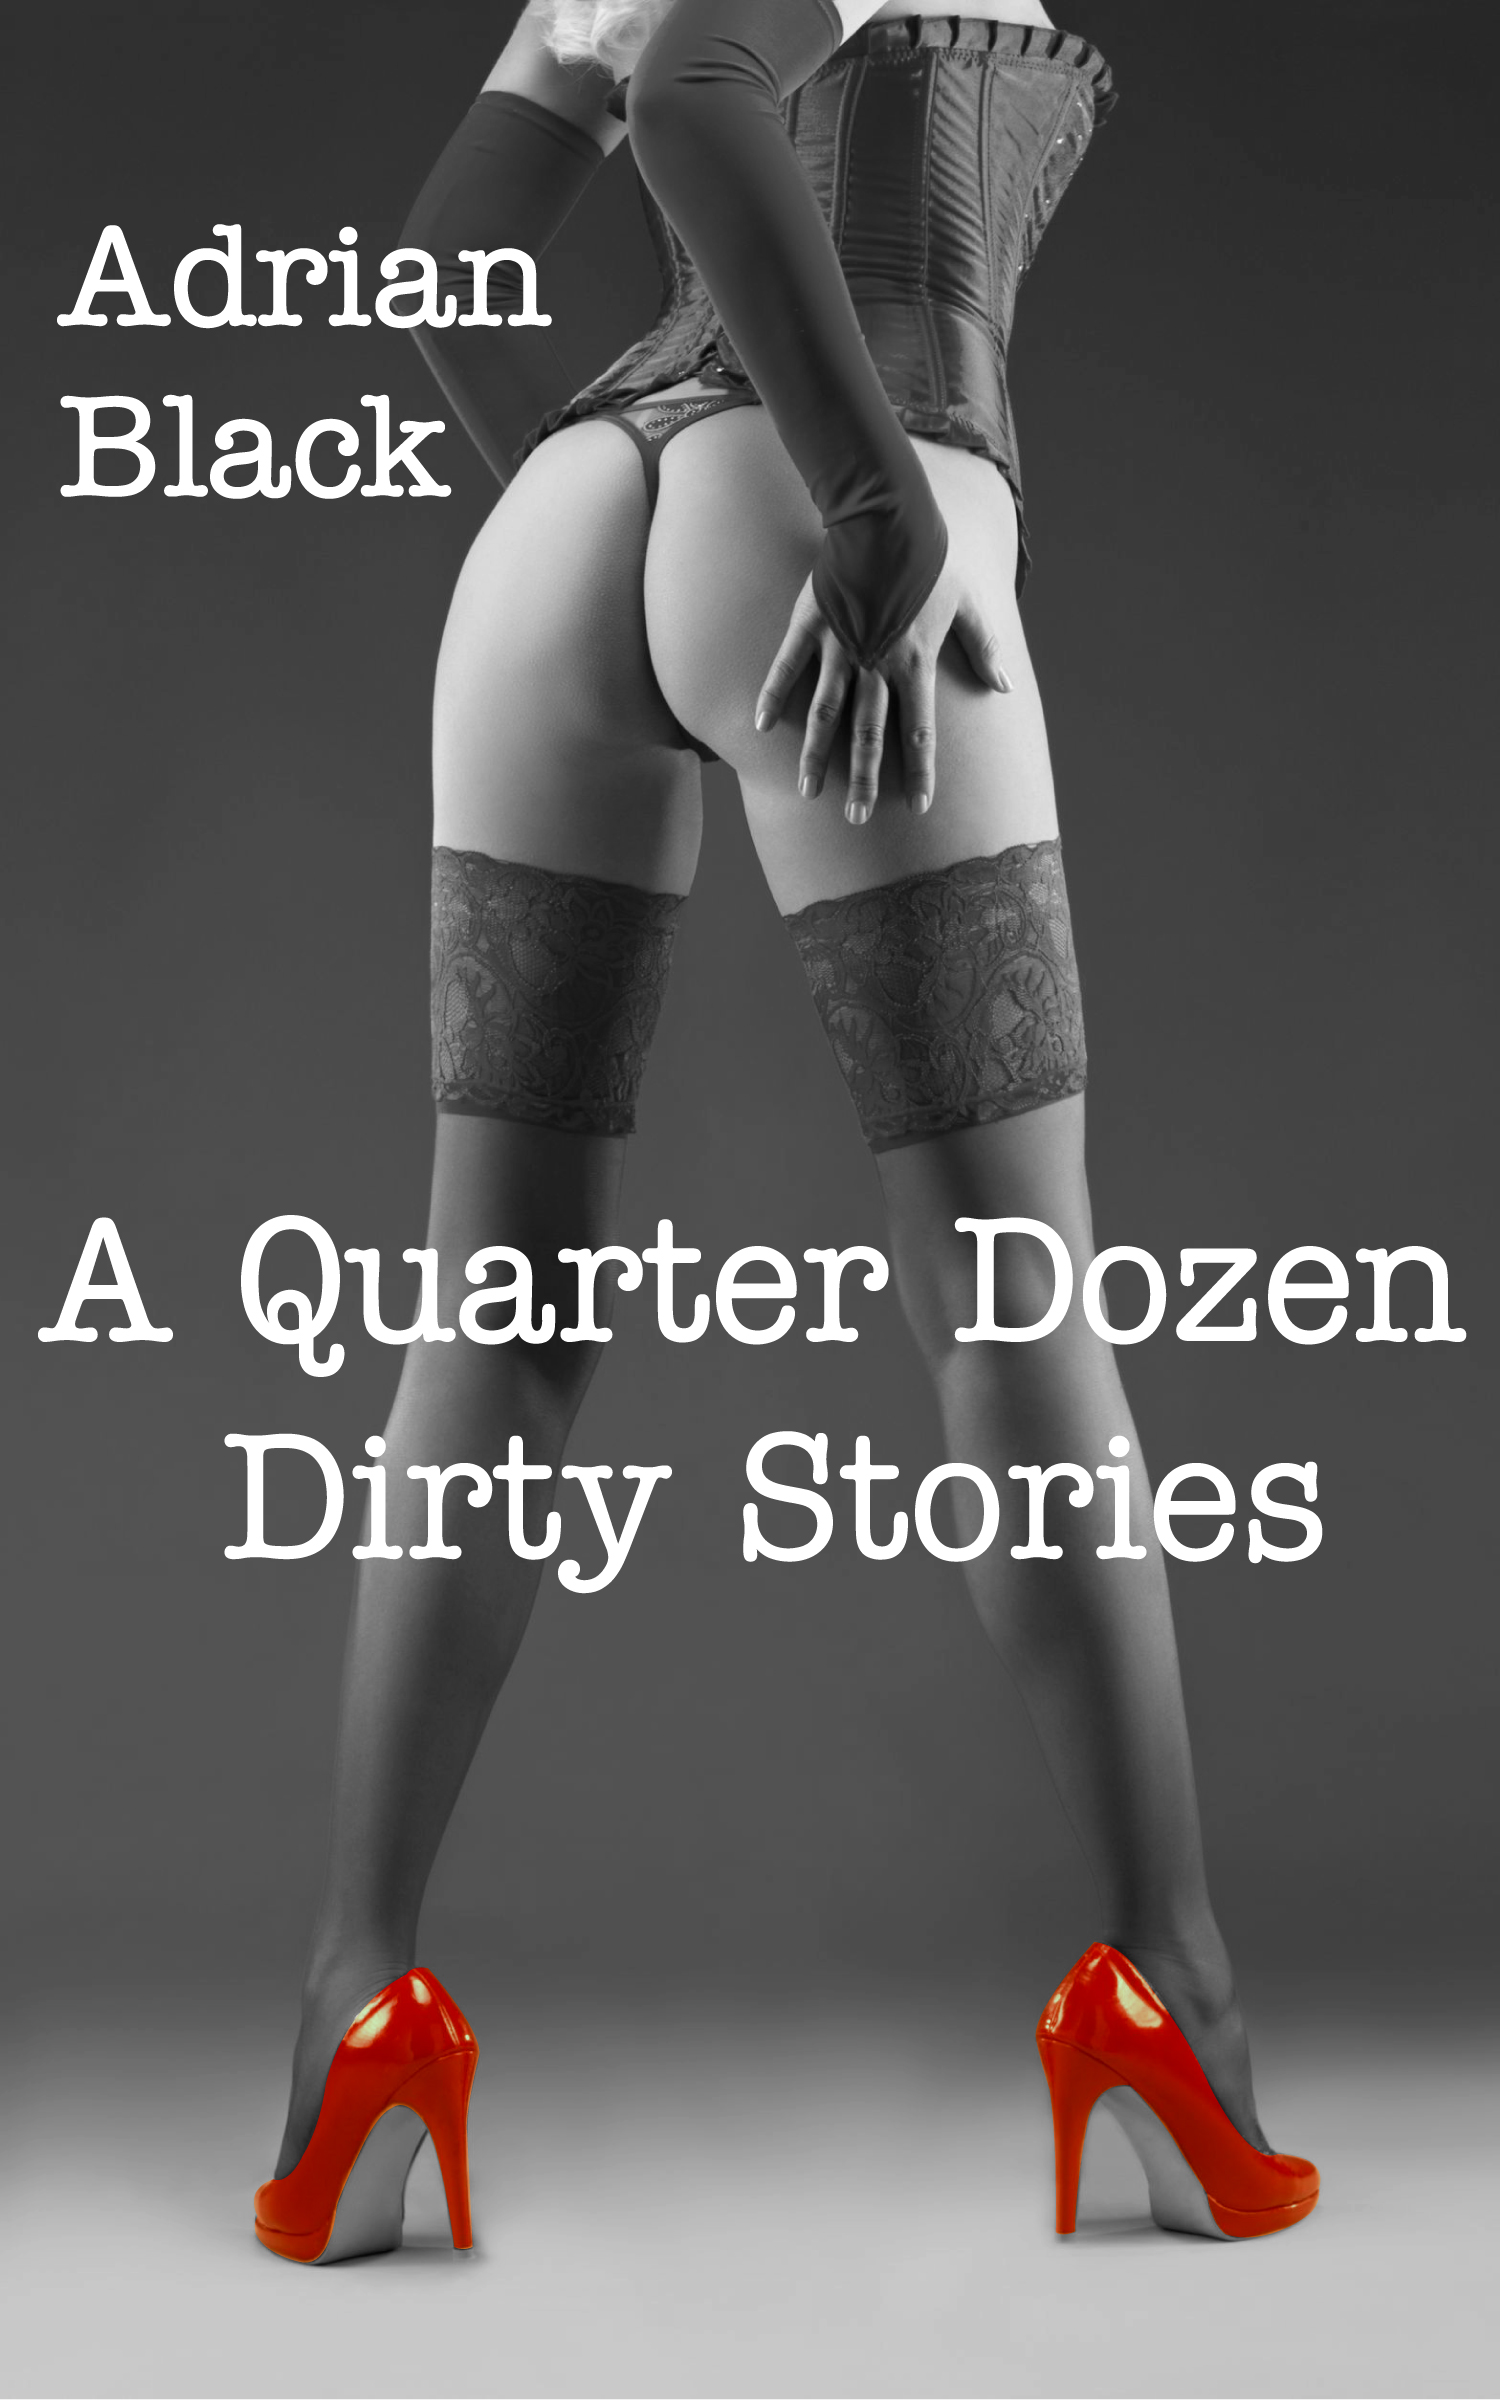 Erotic Stories main menu - straight section